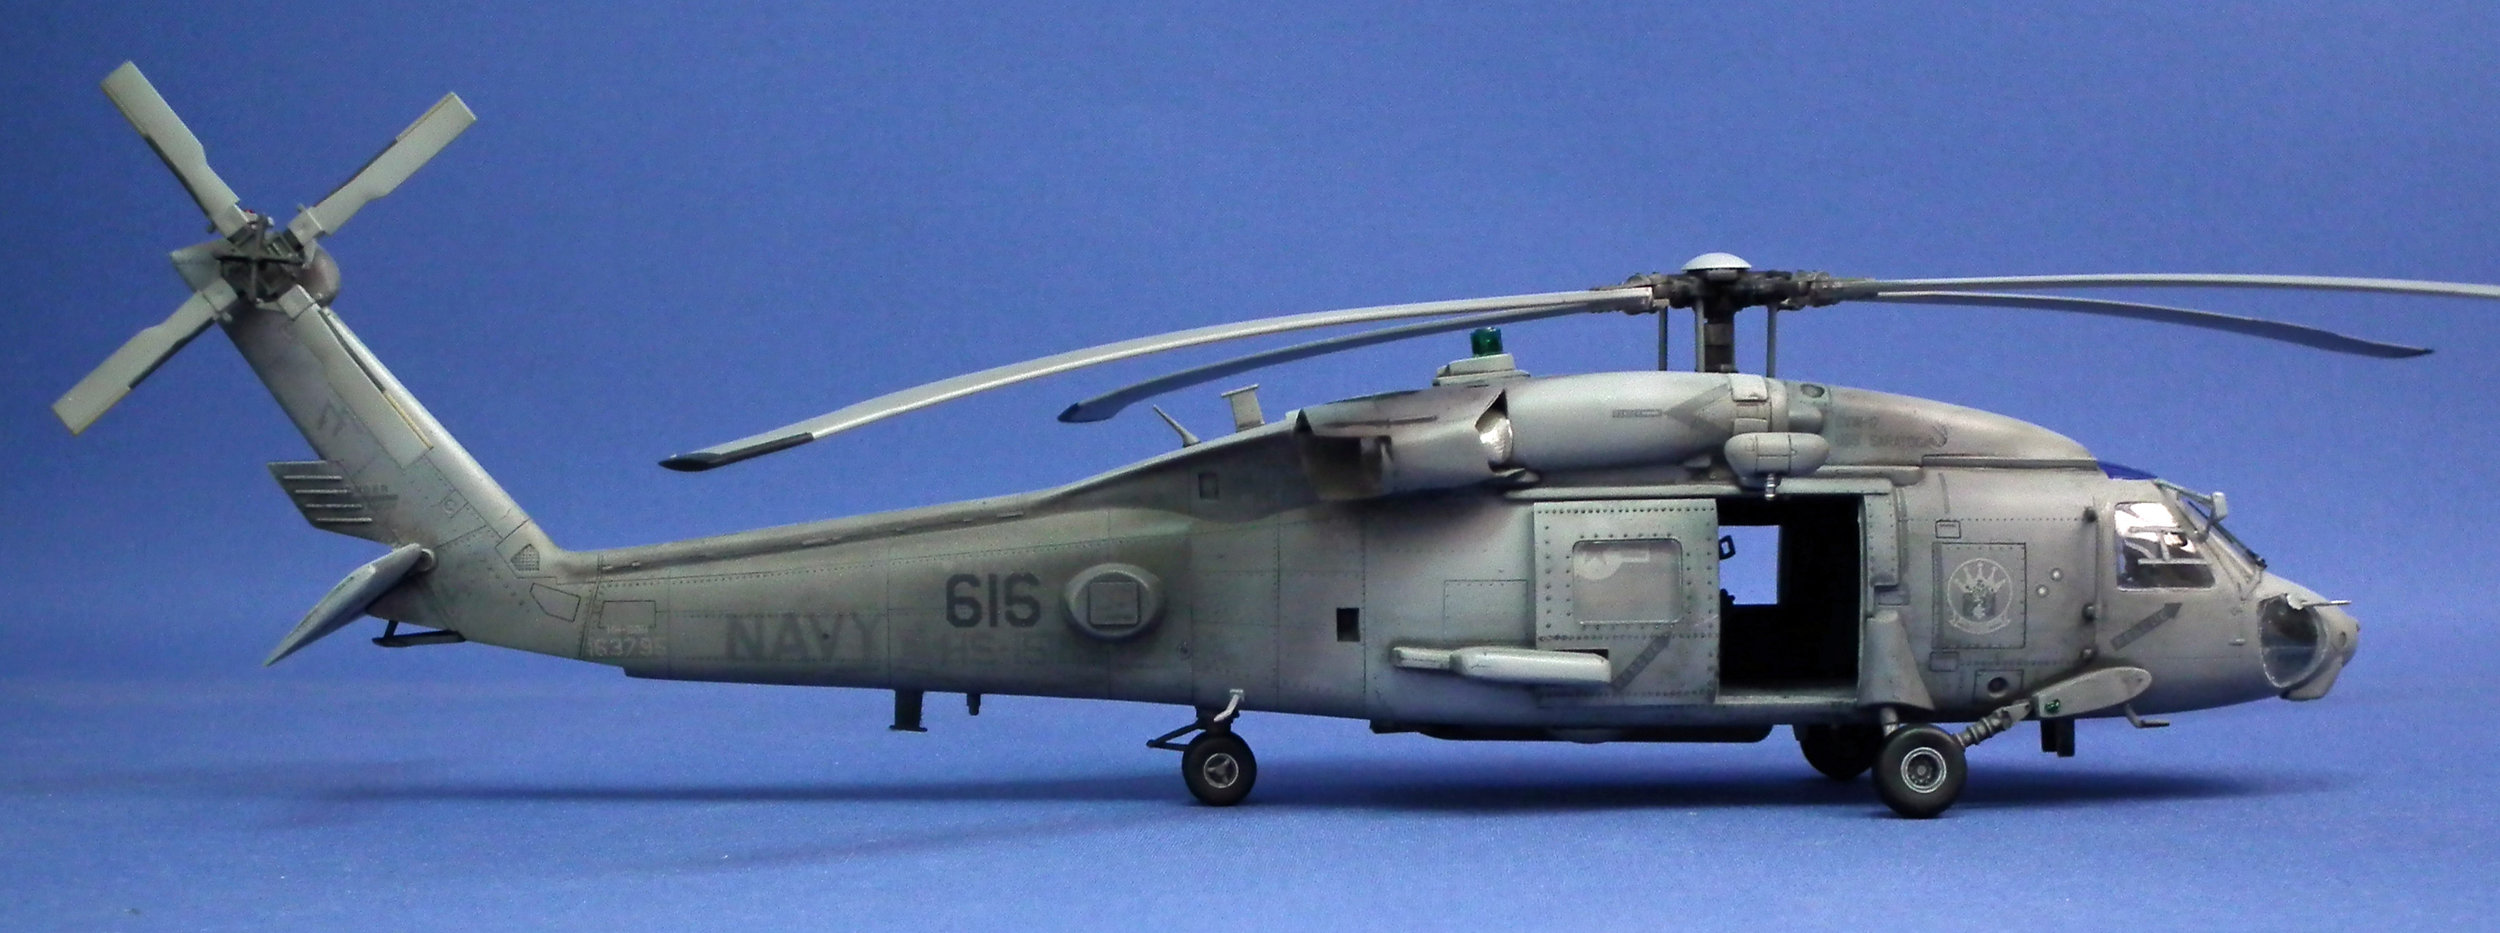 Seahawk 7.JPG